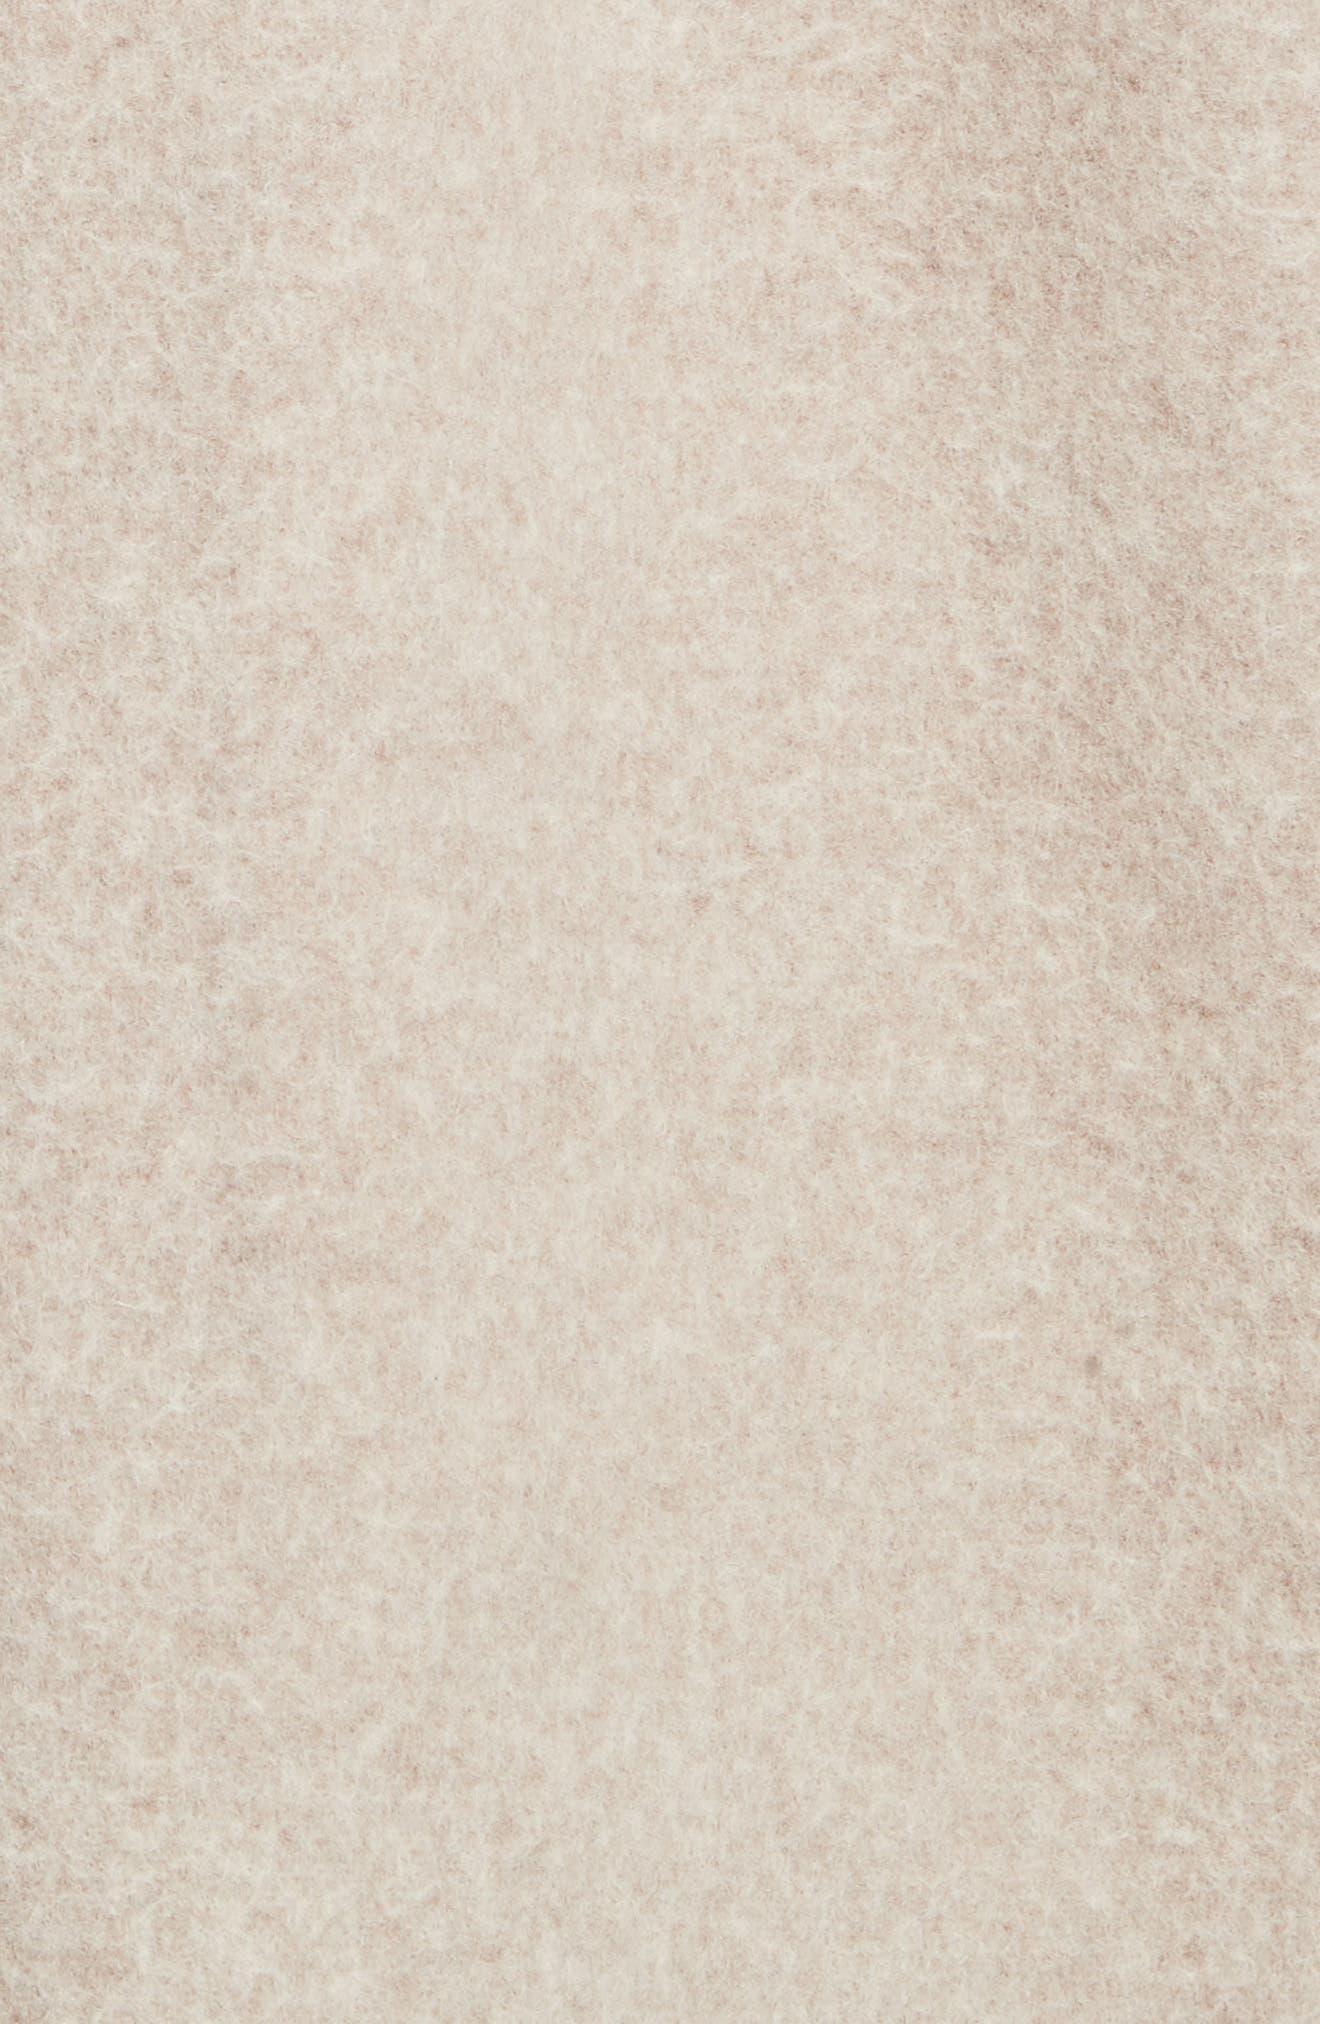 Clairene Hawthorne Wool Cashmere Coat,                             Alternate thumbnail 6, color,                             260